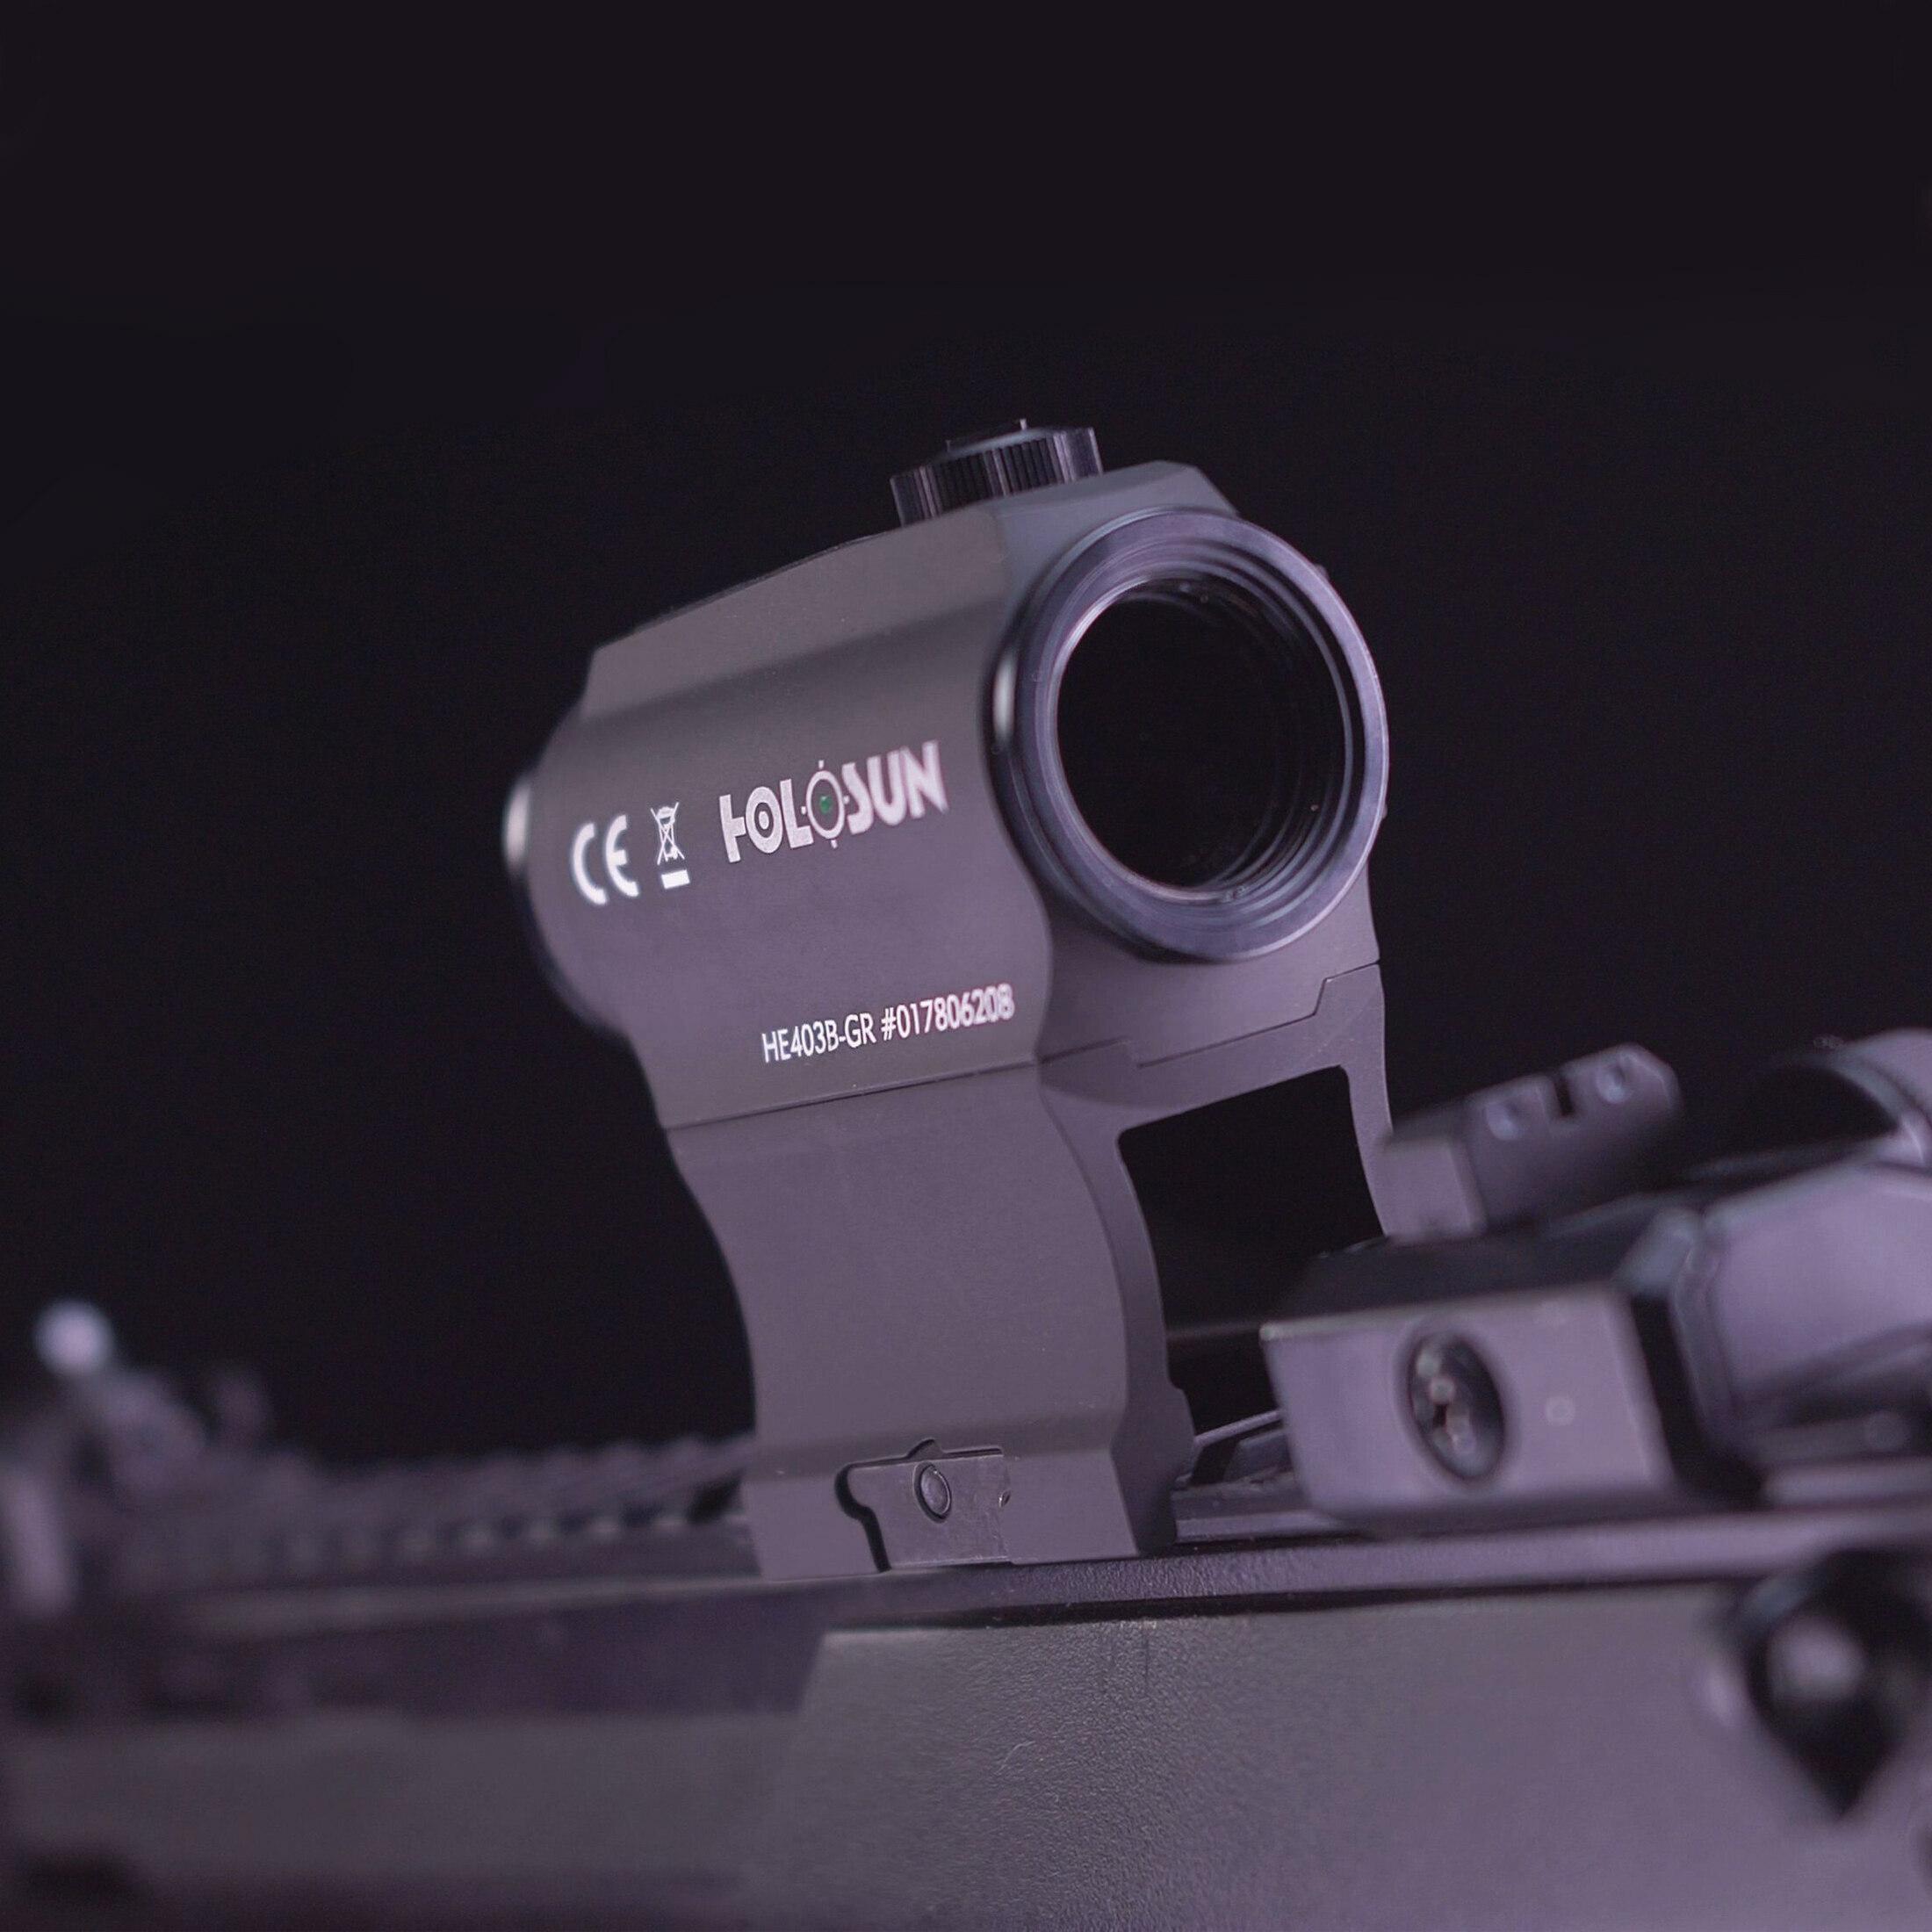 Holosun Dot Sight ELITE HE403B-GR